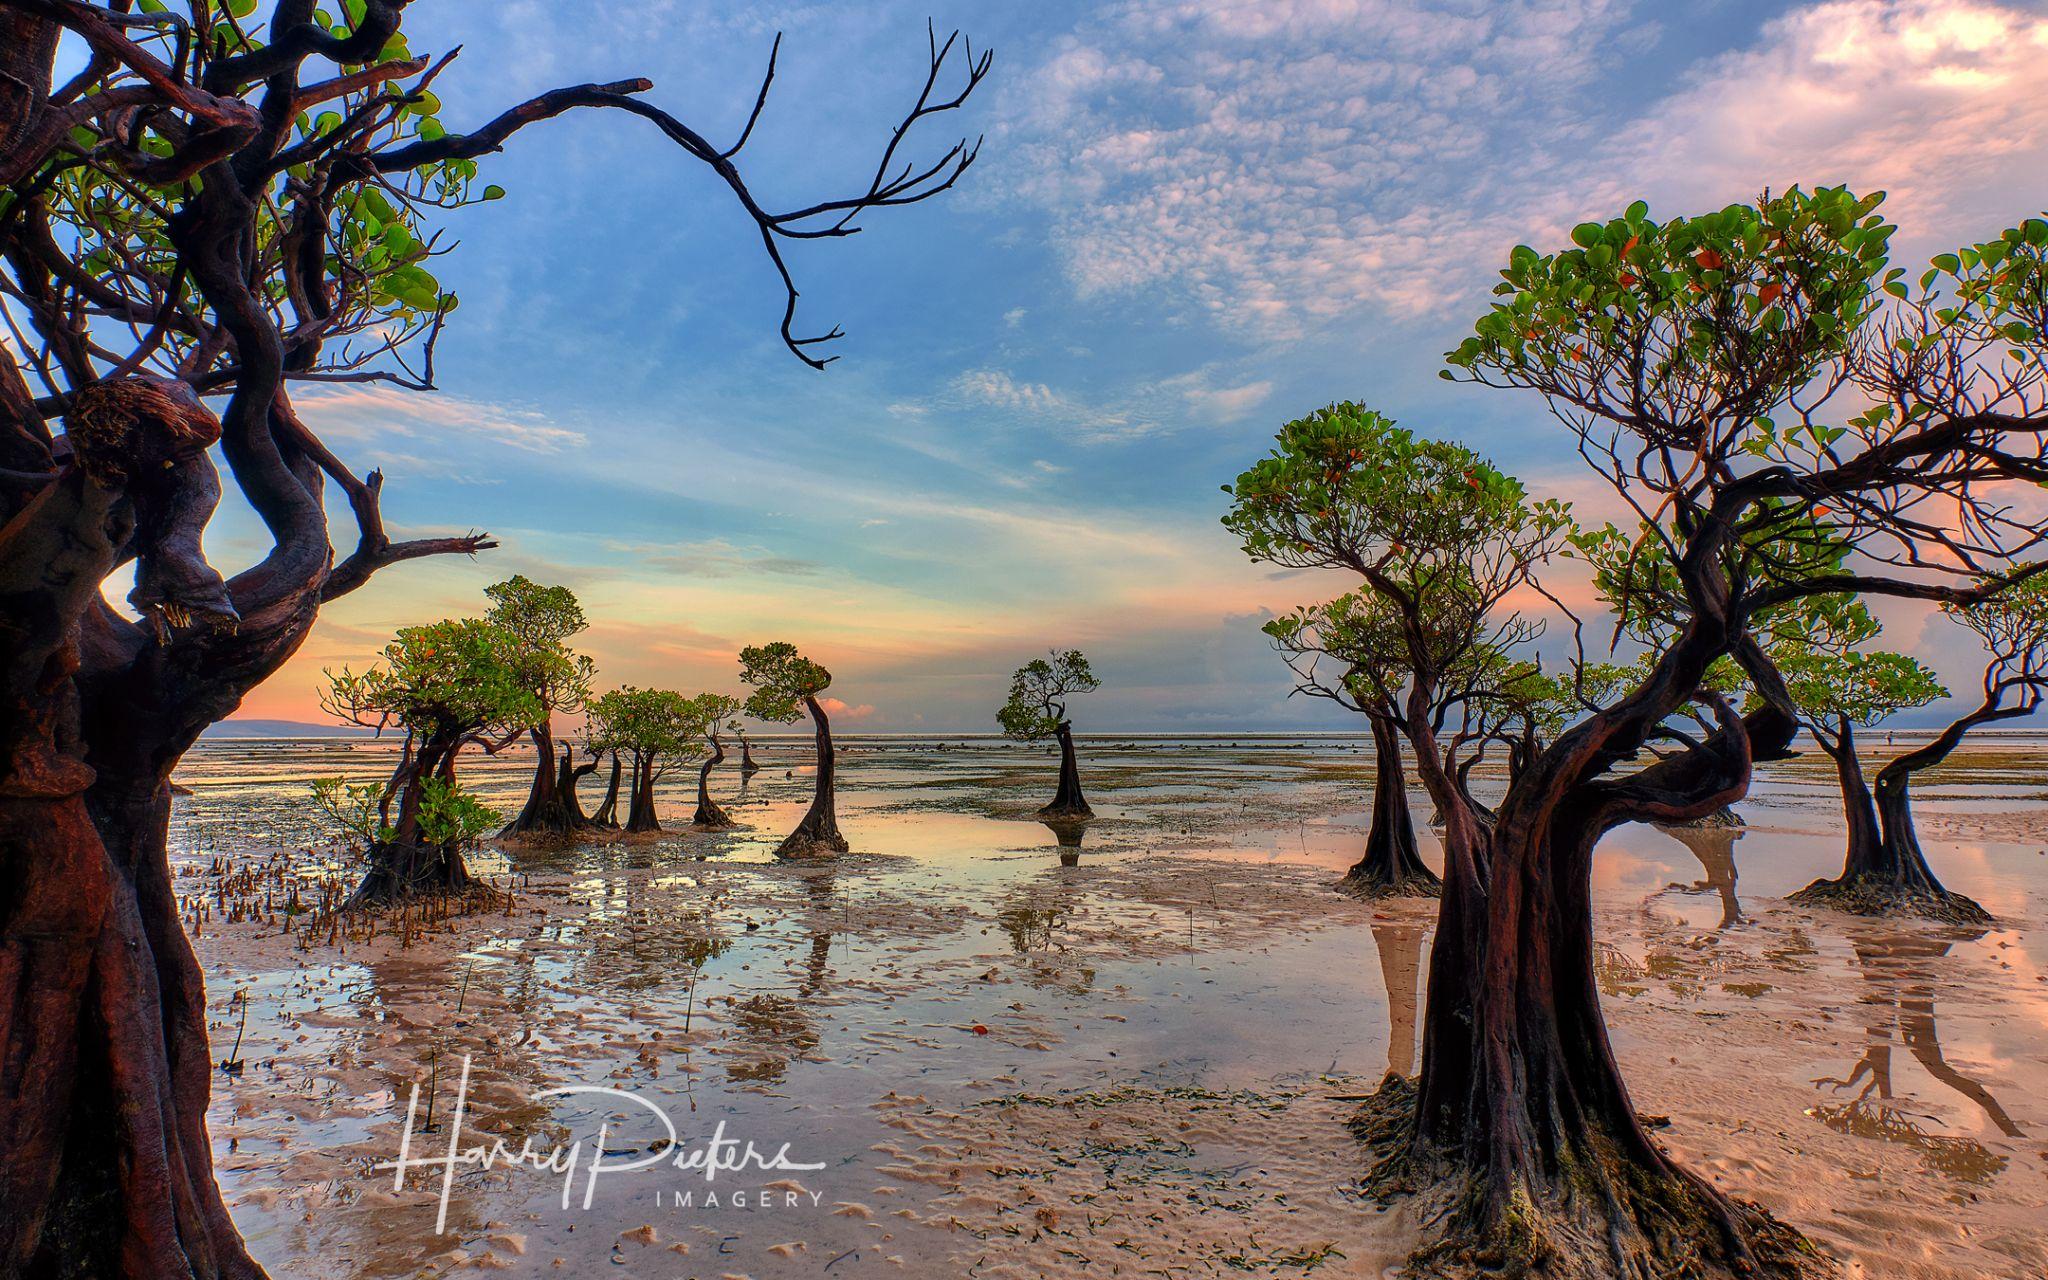 Dancing mangroves at Walakiri Beach, Indonesia